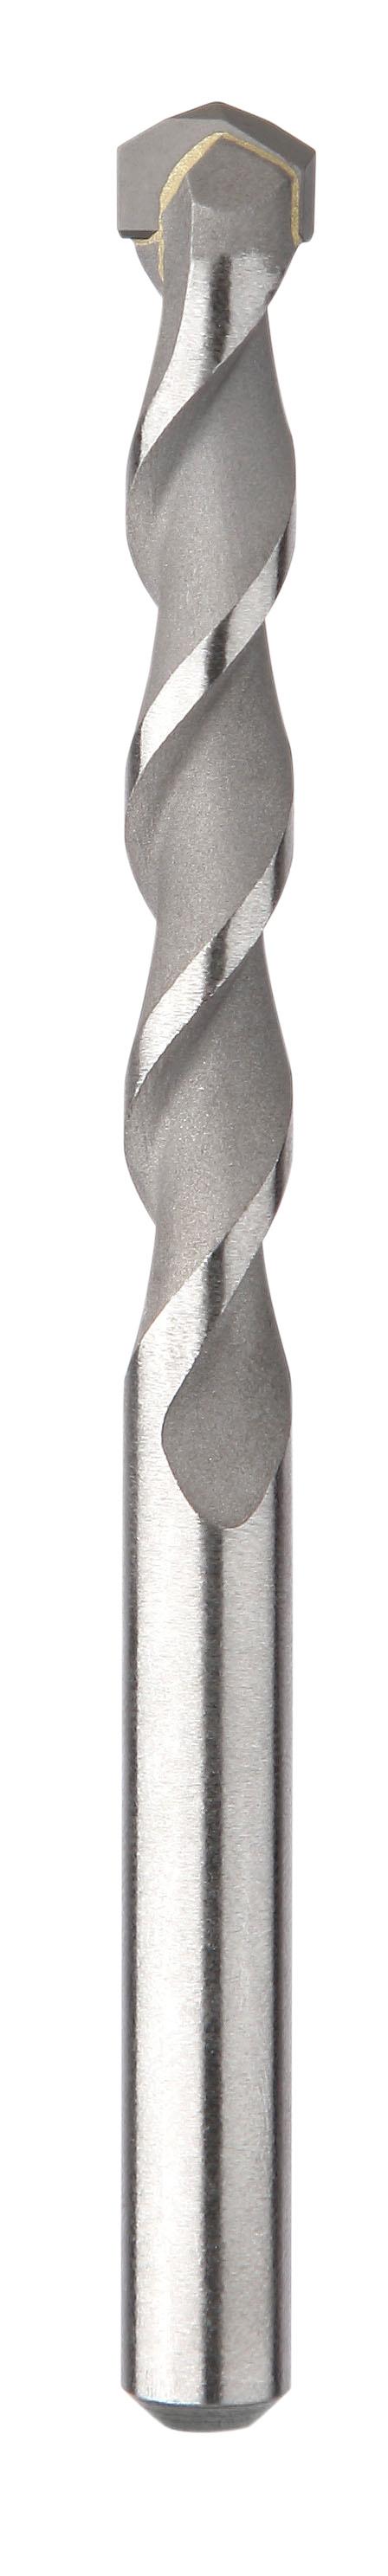 Perçage Granit Coff DUO 8pcs GRANIT Ø3-4-5-6-7-8-9-10 - 208.jpg